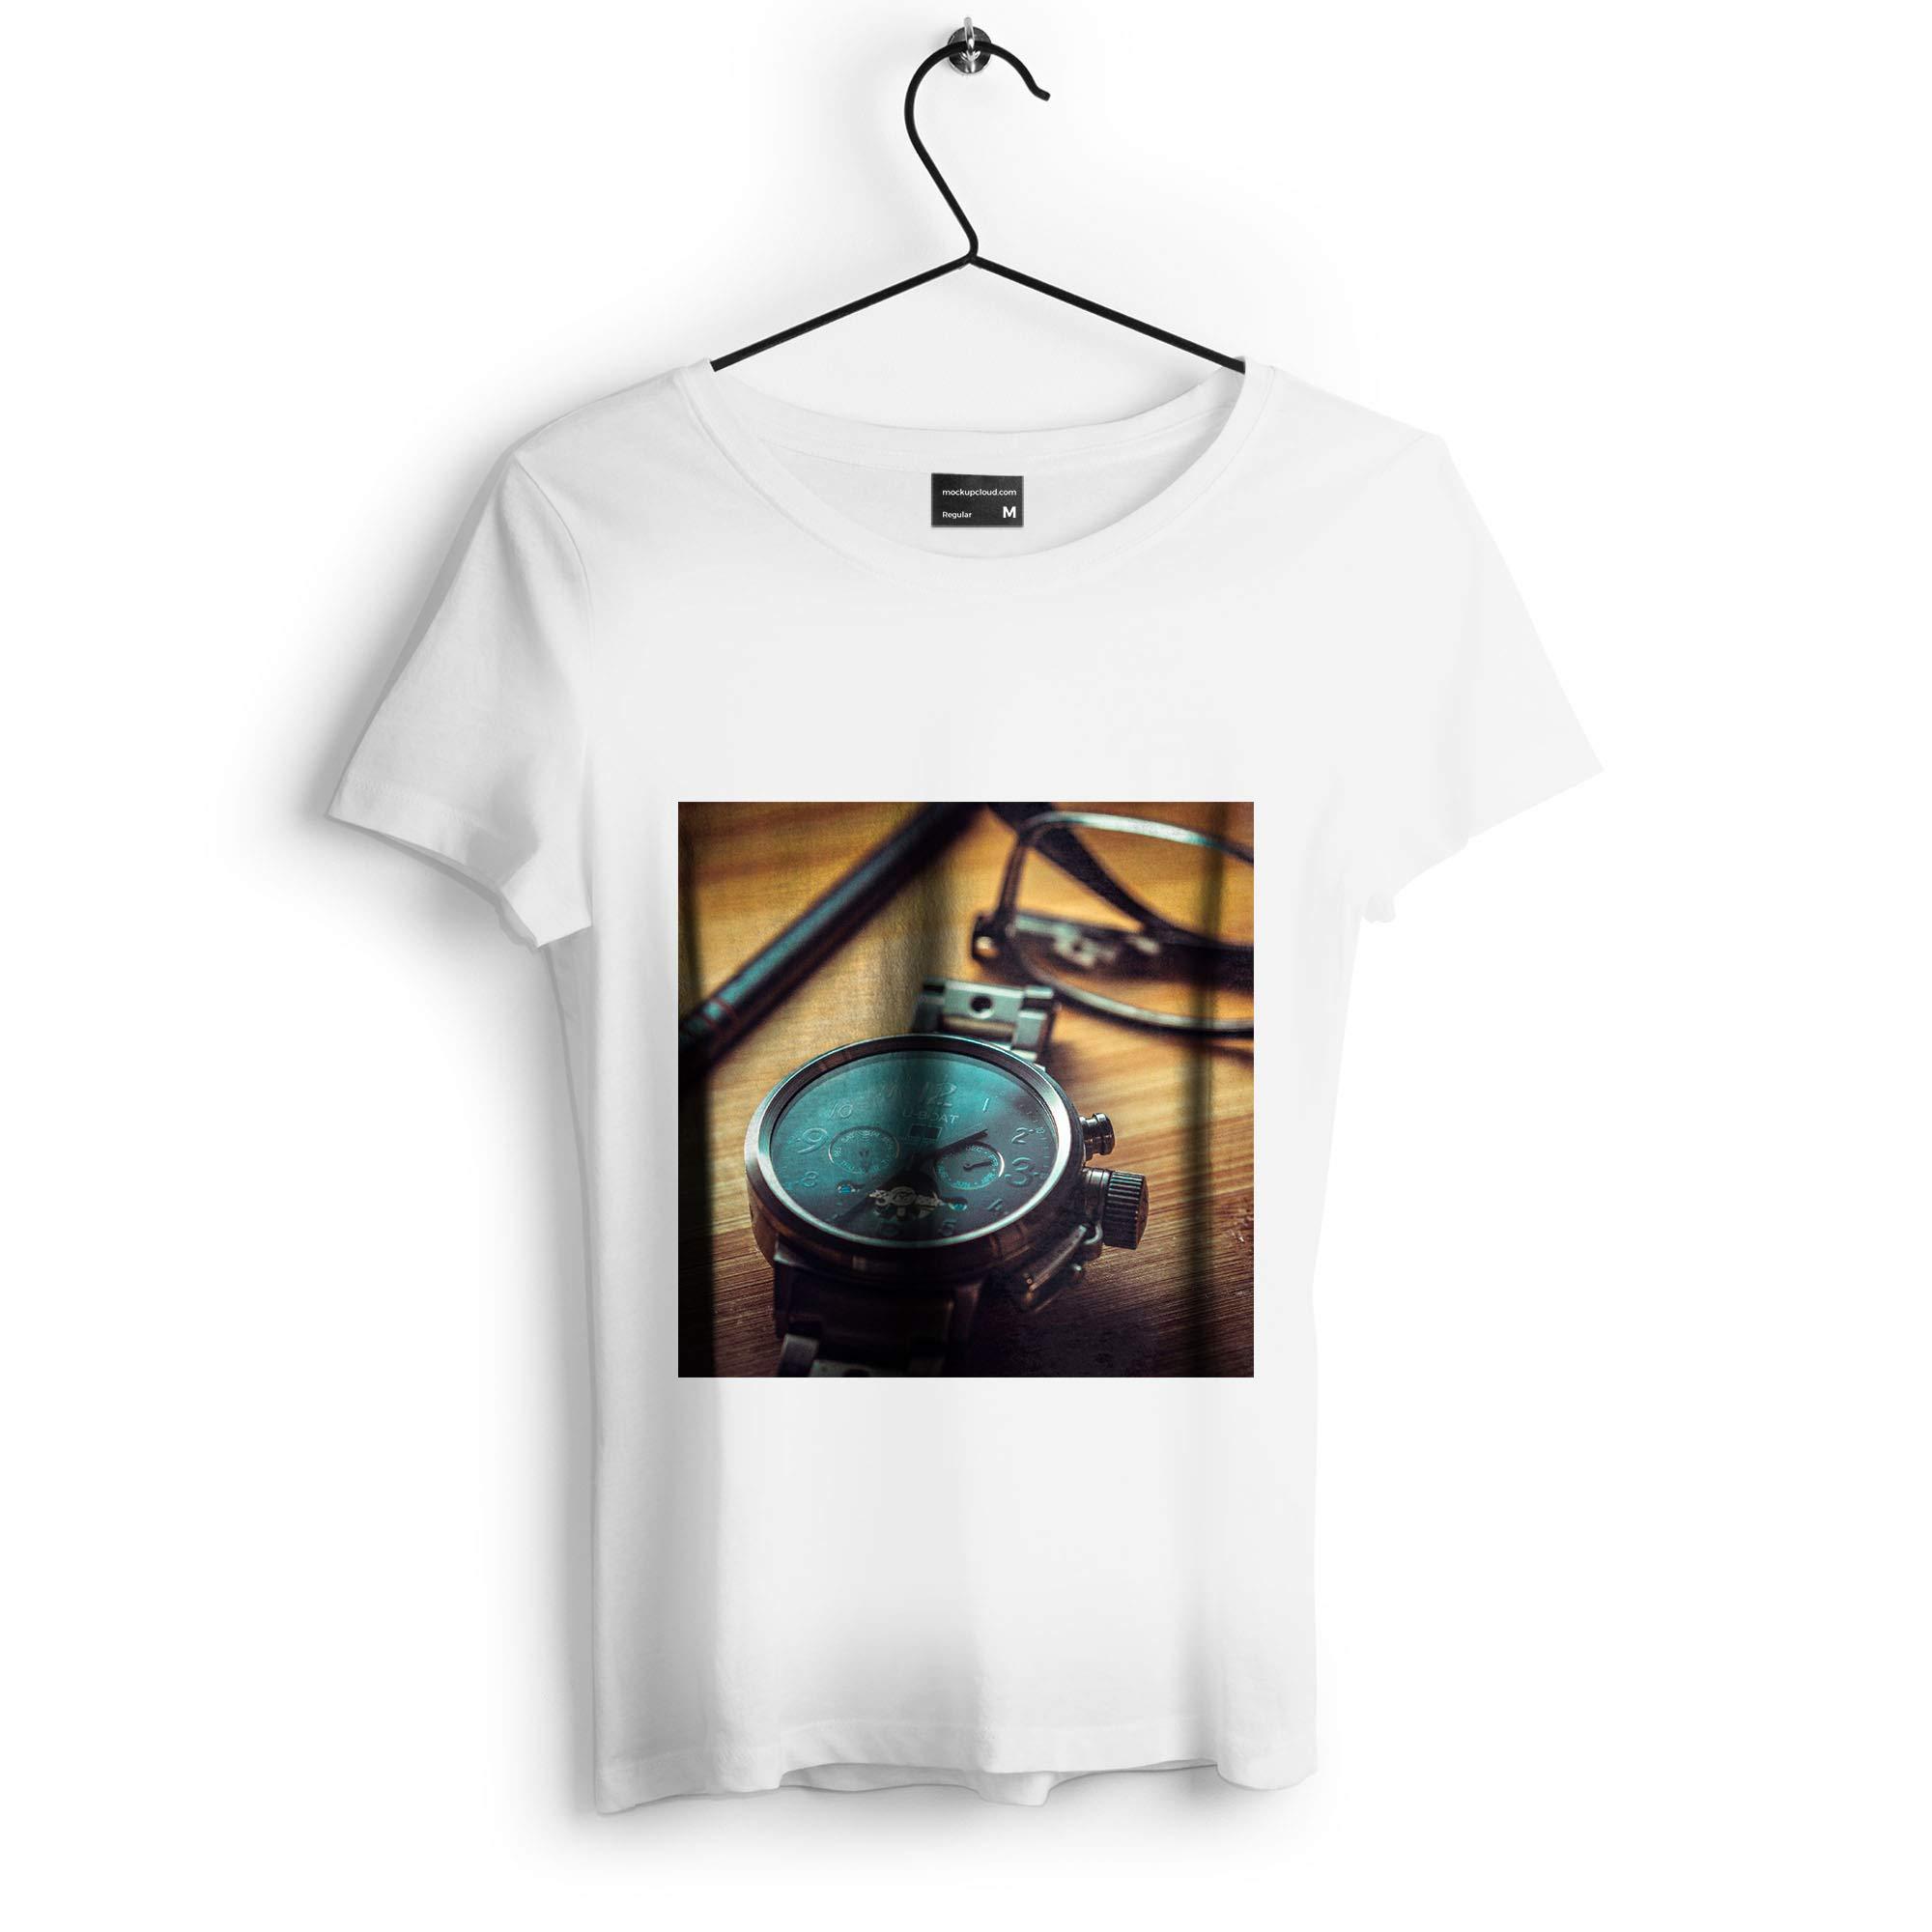 Westlake Art - Watch Strap - Unisex Tshirt - Picture Photography Artwork Shirt - White Adult Medium (D41D8) by Westlake Art